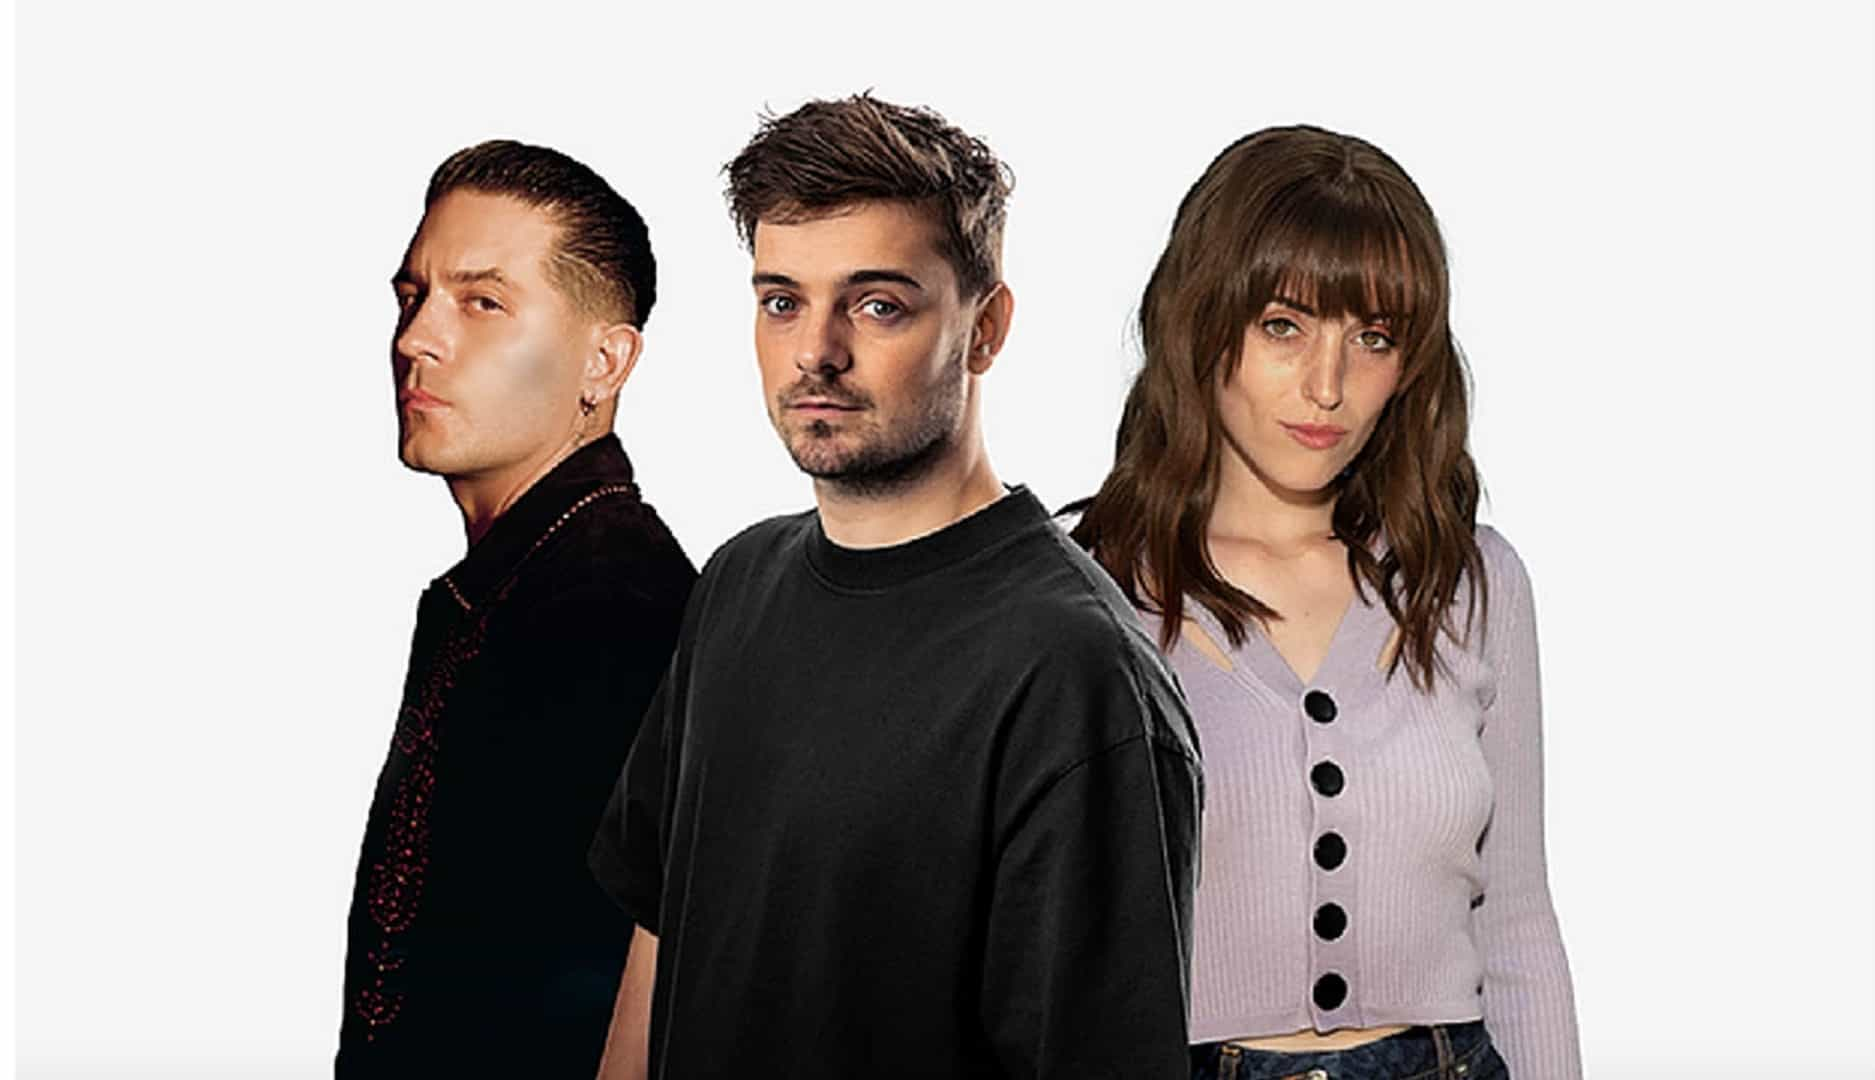 Martin Garrix, G-Eazy, Sasha Alex Sloan